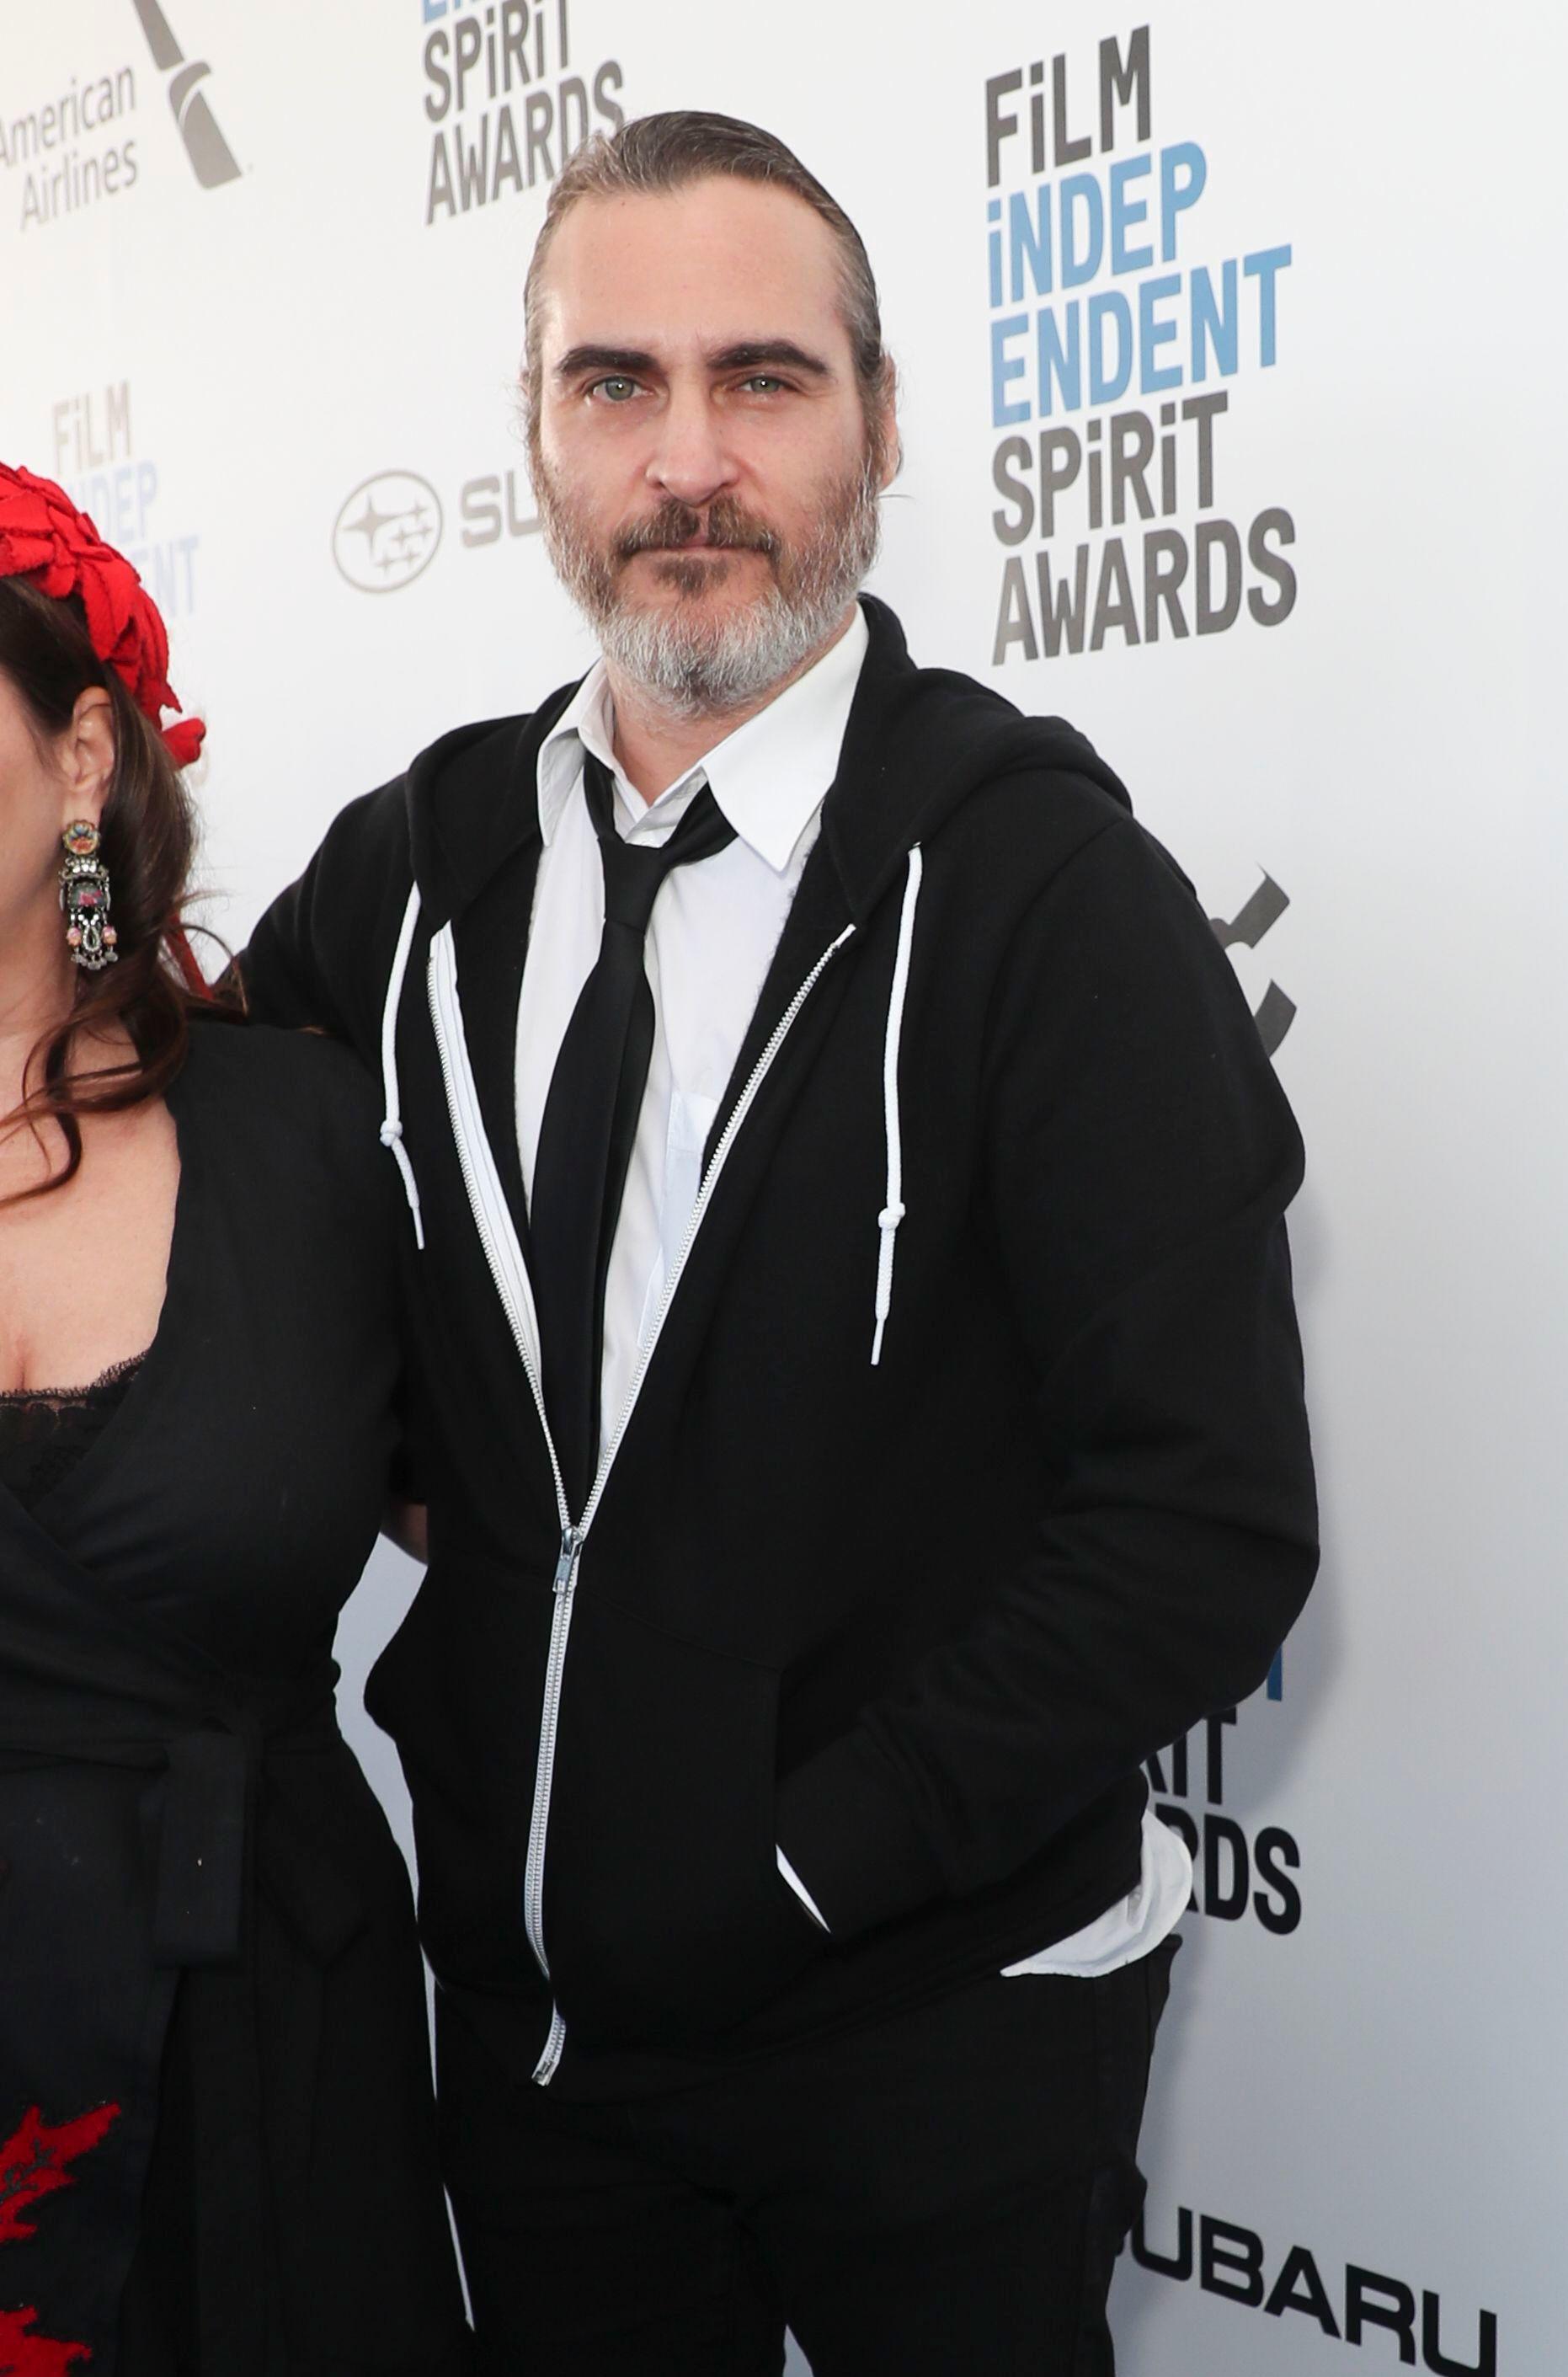 Joaquin Phoenix attends the 34th Film Independent Spirit Awards in Santa Monica, Calif., on Feb. 23, 2019.